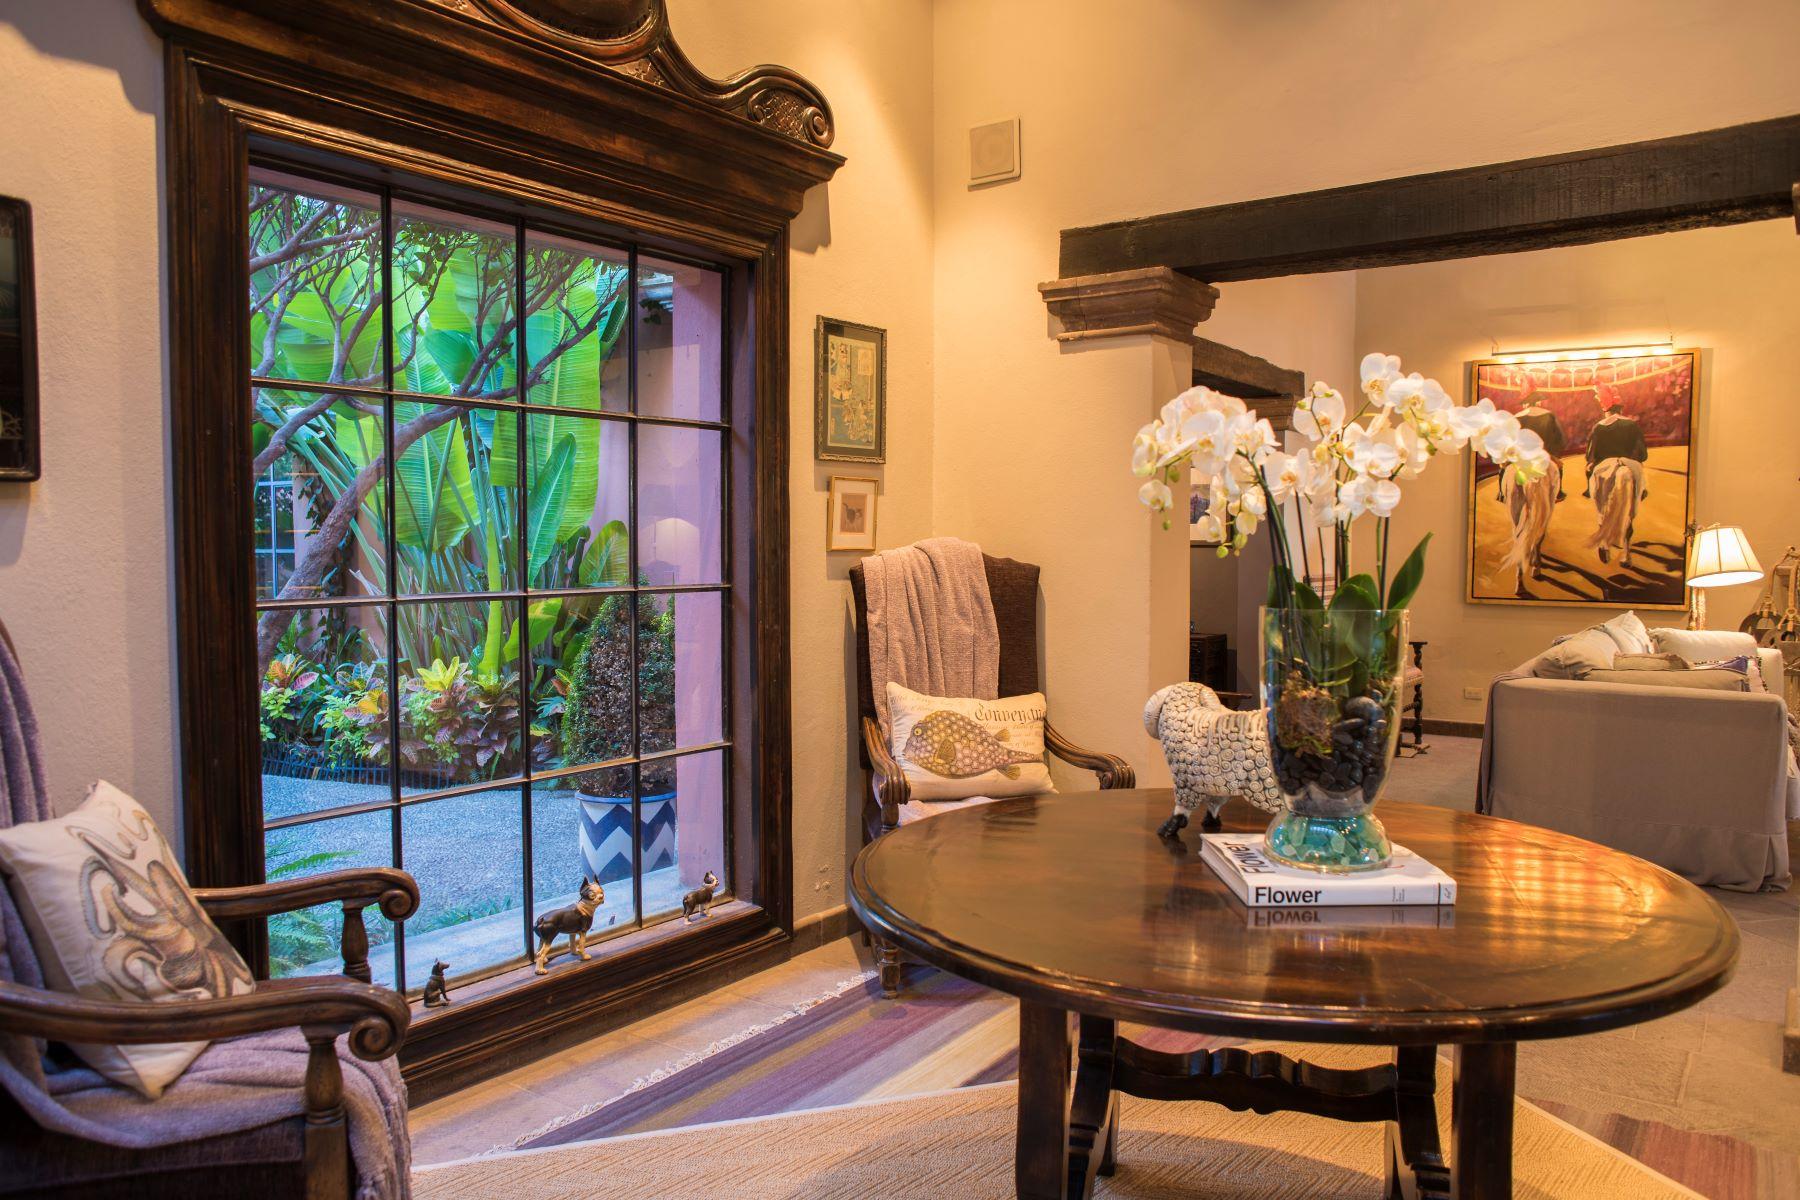 Additional photo for property listing at CASA CINCO LEONES Centro, San Miguel De Allende, Guanajuato Mexico